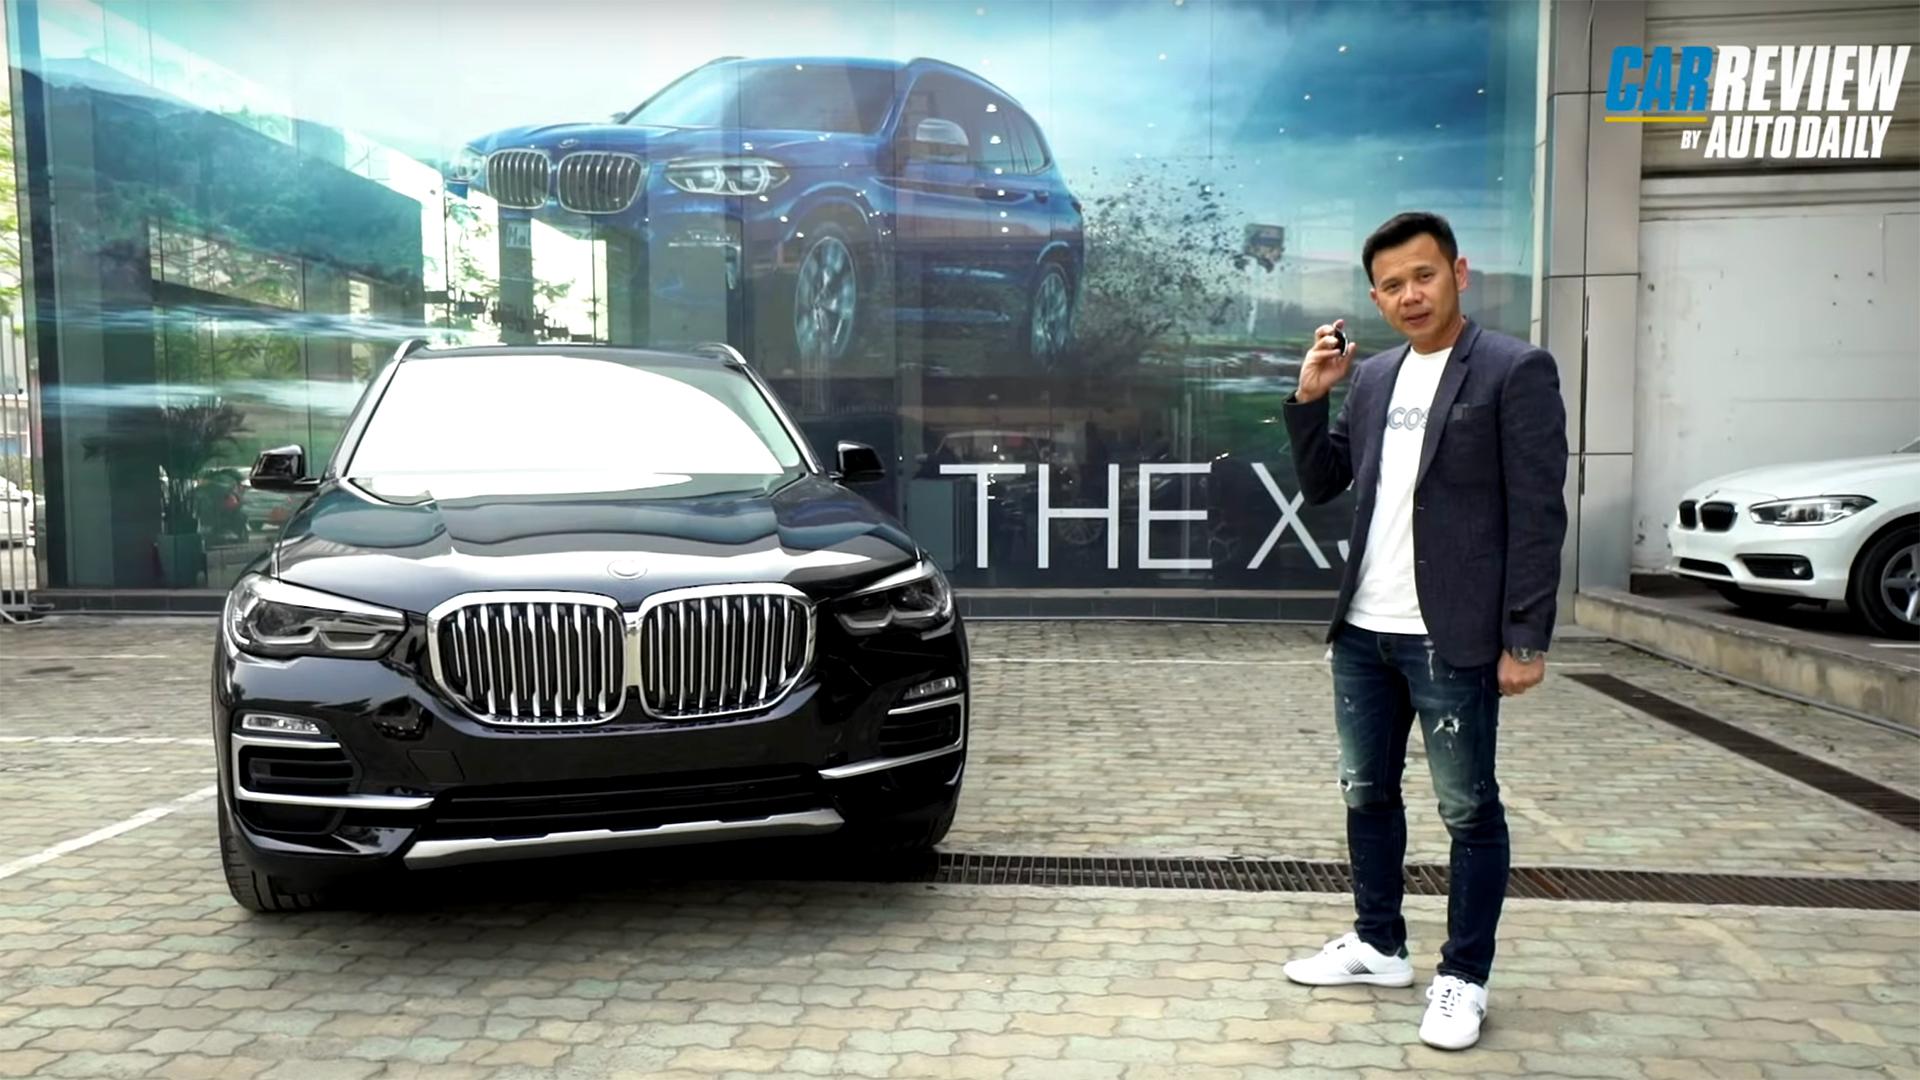 BMW X5 2020 40i - Cần số pha lê đấu Mercedes GLE, Lexus RX